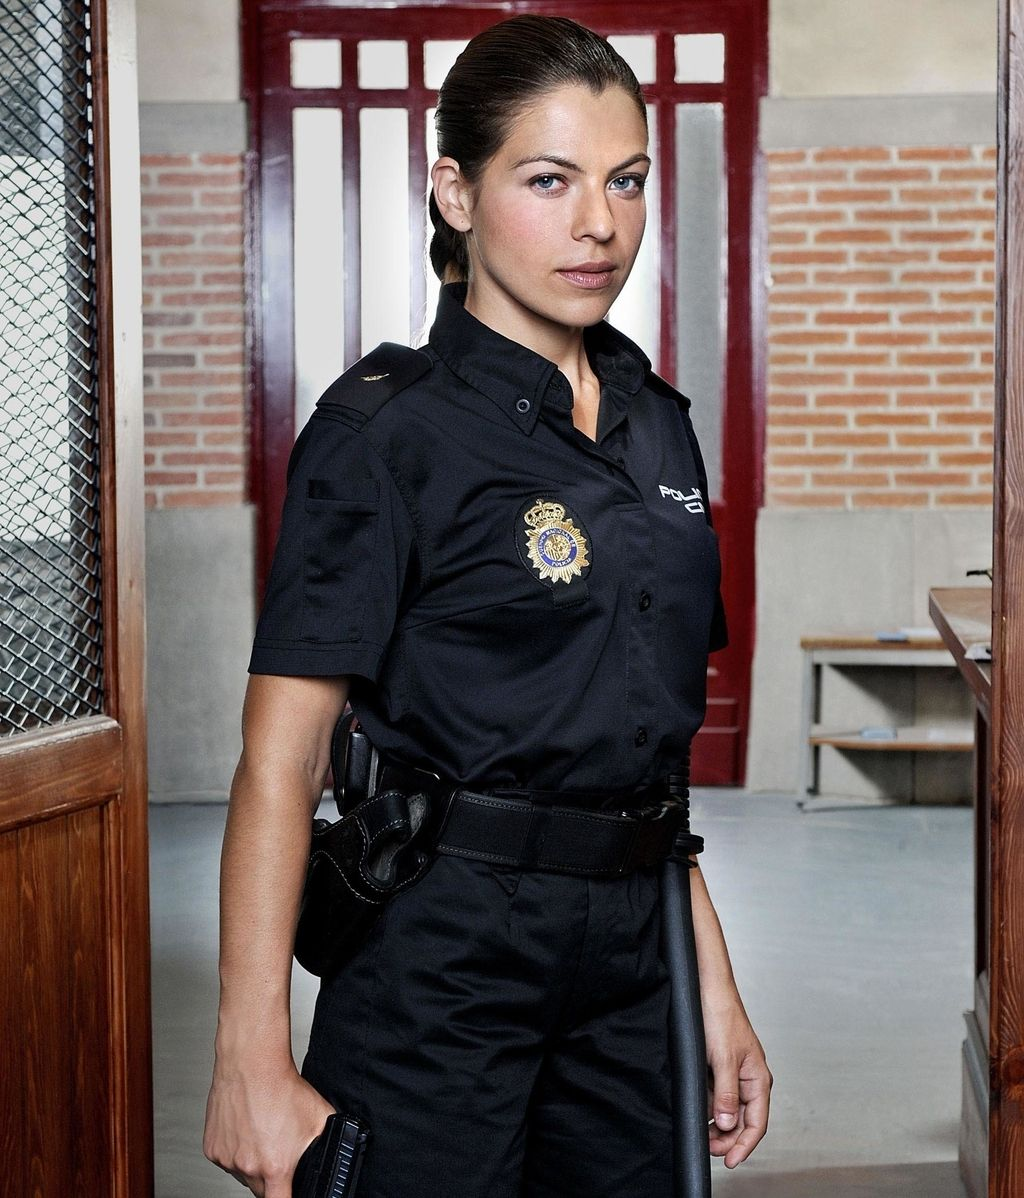 Mati (Thair Blume), mujer policía en un ambiente hostil